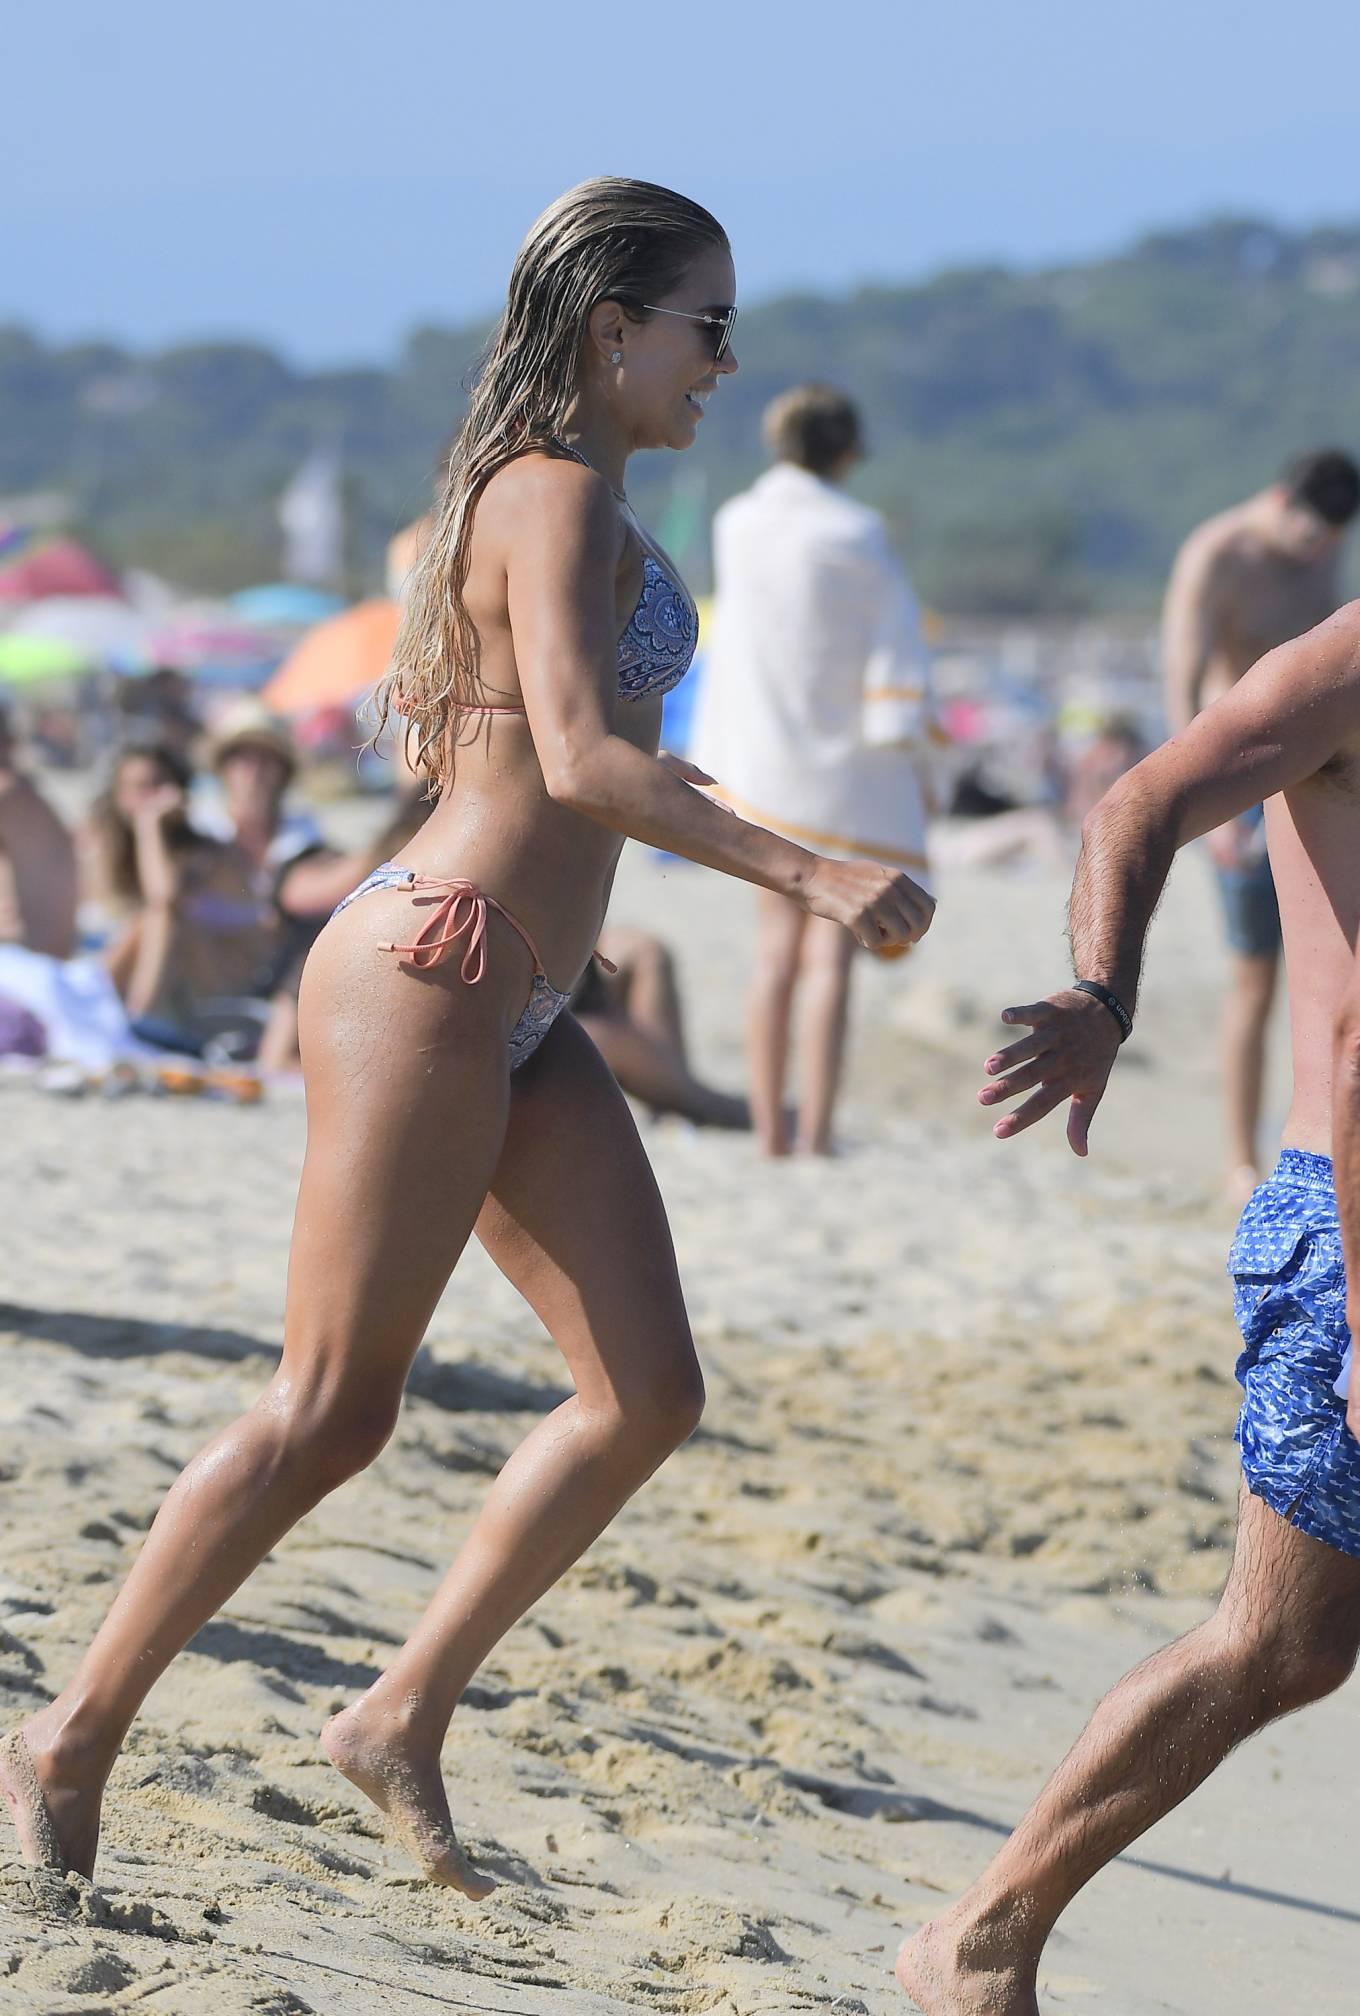 Sylvie Meis 2021 : Sylvie Meis – In a bikini with her husband Niclas Castello on the beach La Réserve in Ramatuelle-10